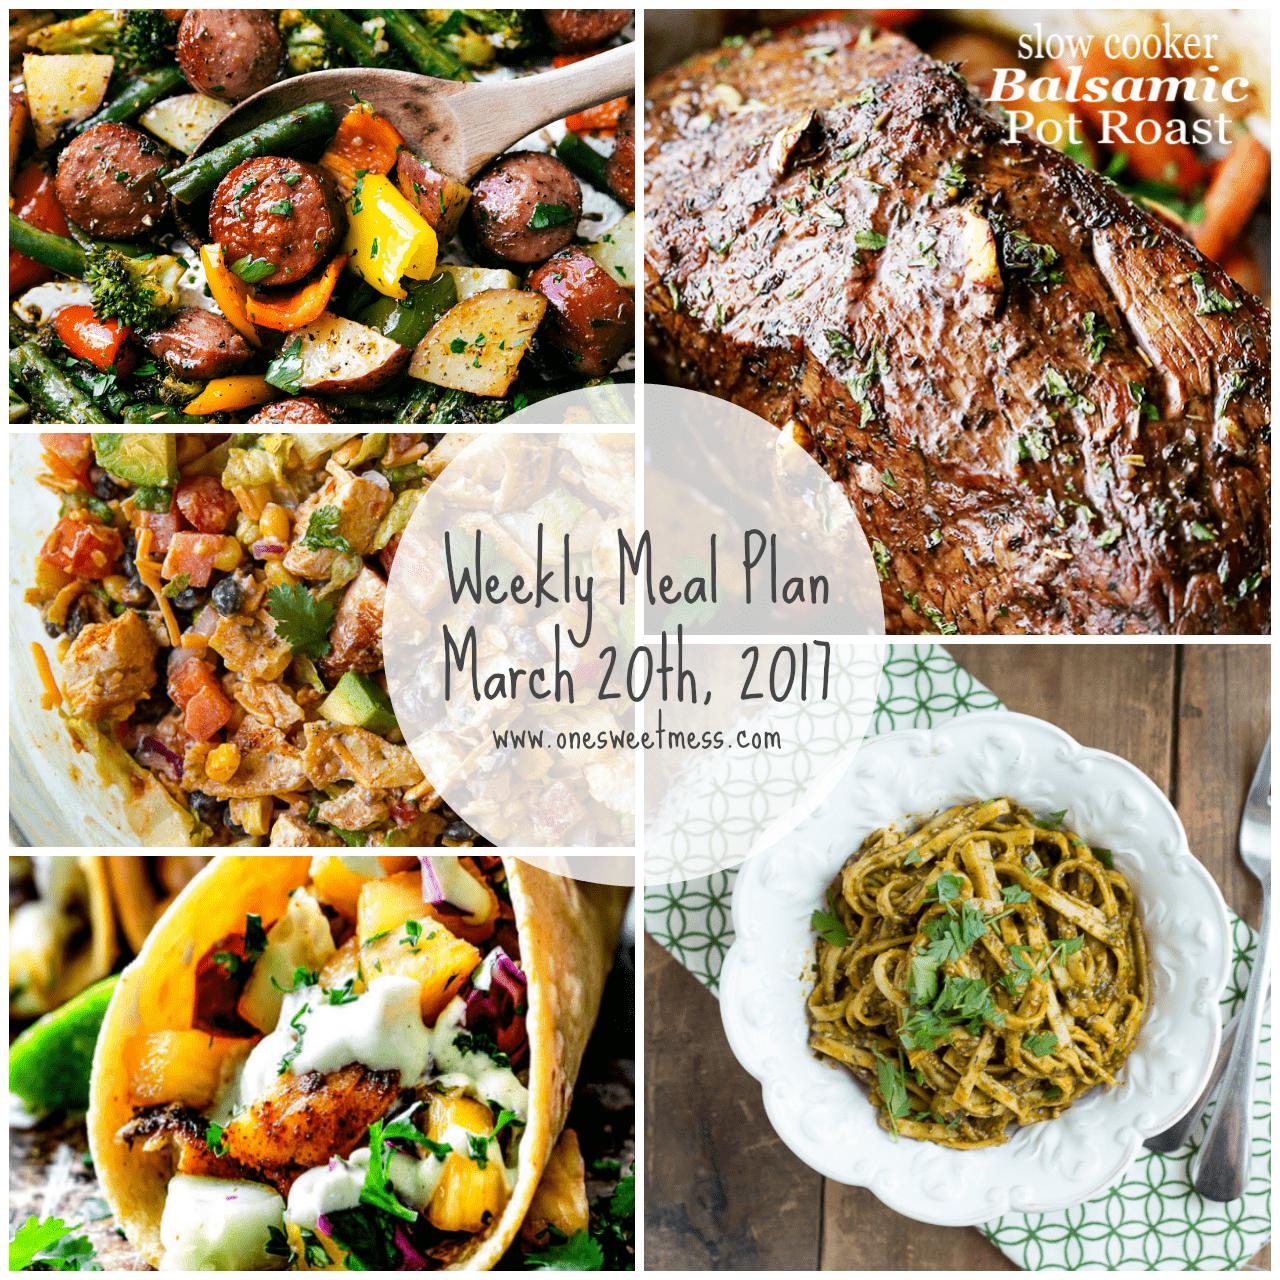 Week of March 20th, 2017 Weekly Meal Plan + Printable Grocery List